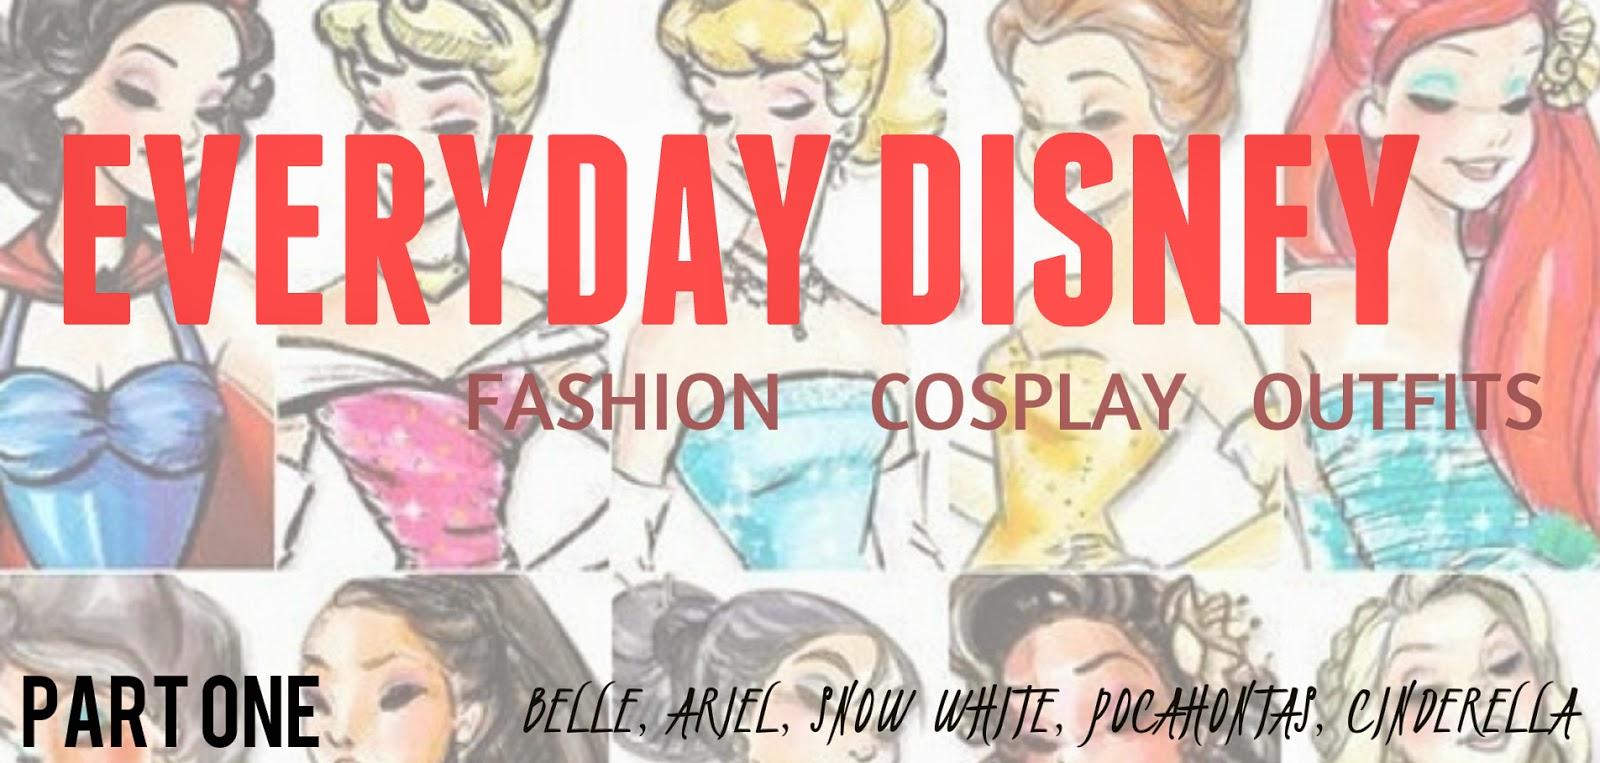 http://kerryshabitat.blogspot.co.uk/2014/06/everyday-disney-outfits-princesses-part.html